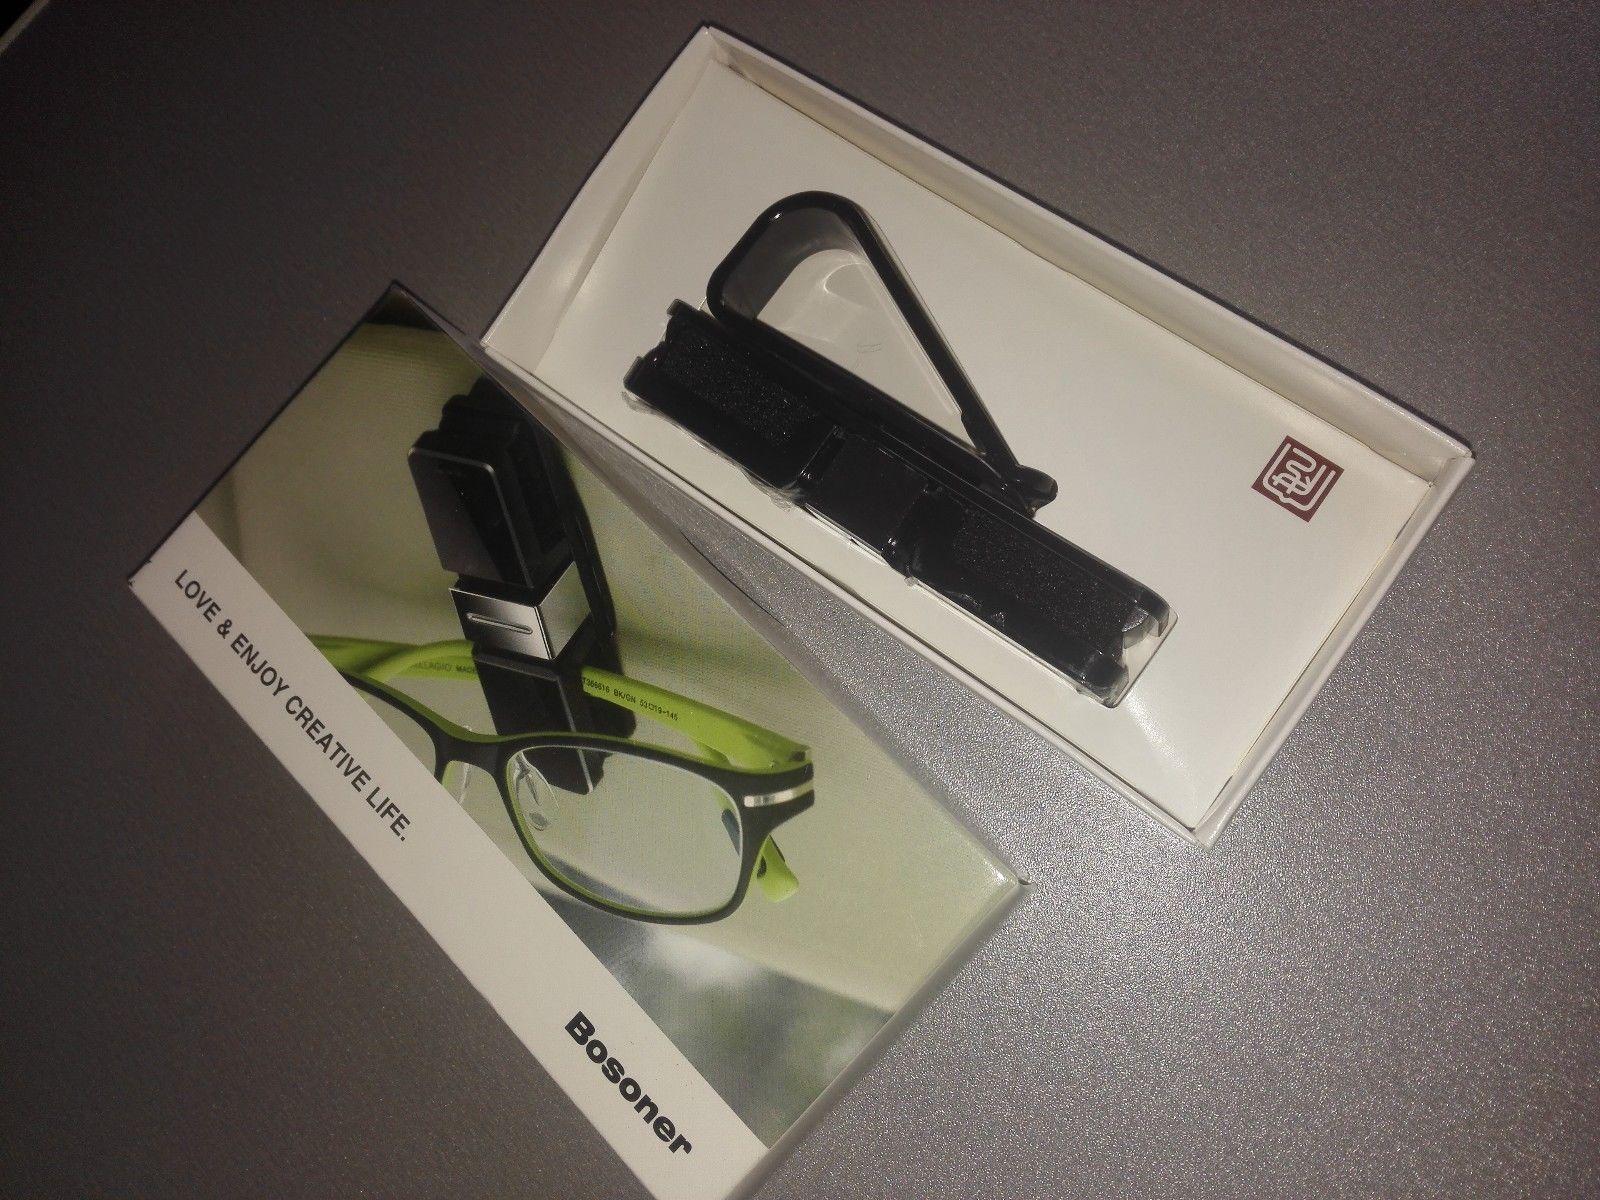 bdf2ac3aac Car Double Sunglasses Holder For BMW M E60 E61 E90 E92 X1 F48 1 5 3 7 X X5  X6 Canada 2018 From Zhengweiling